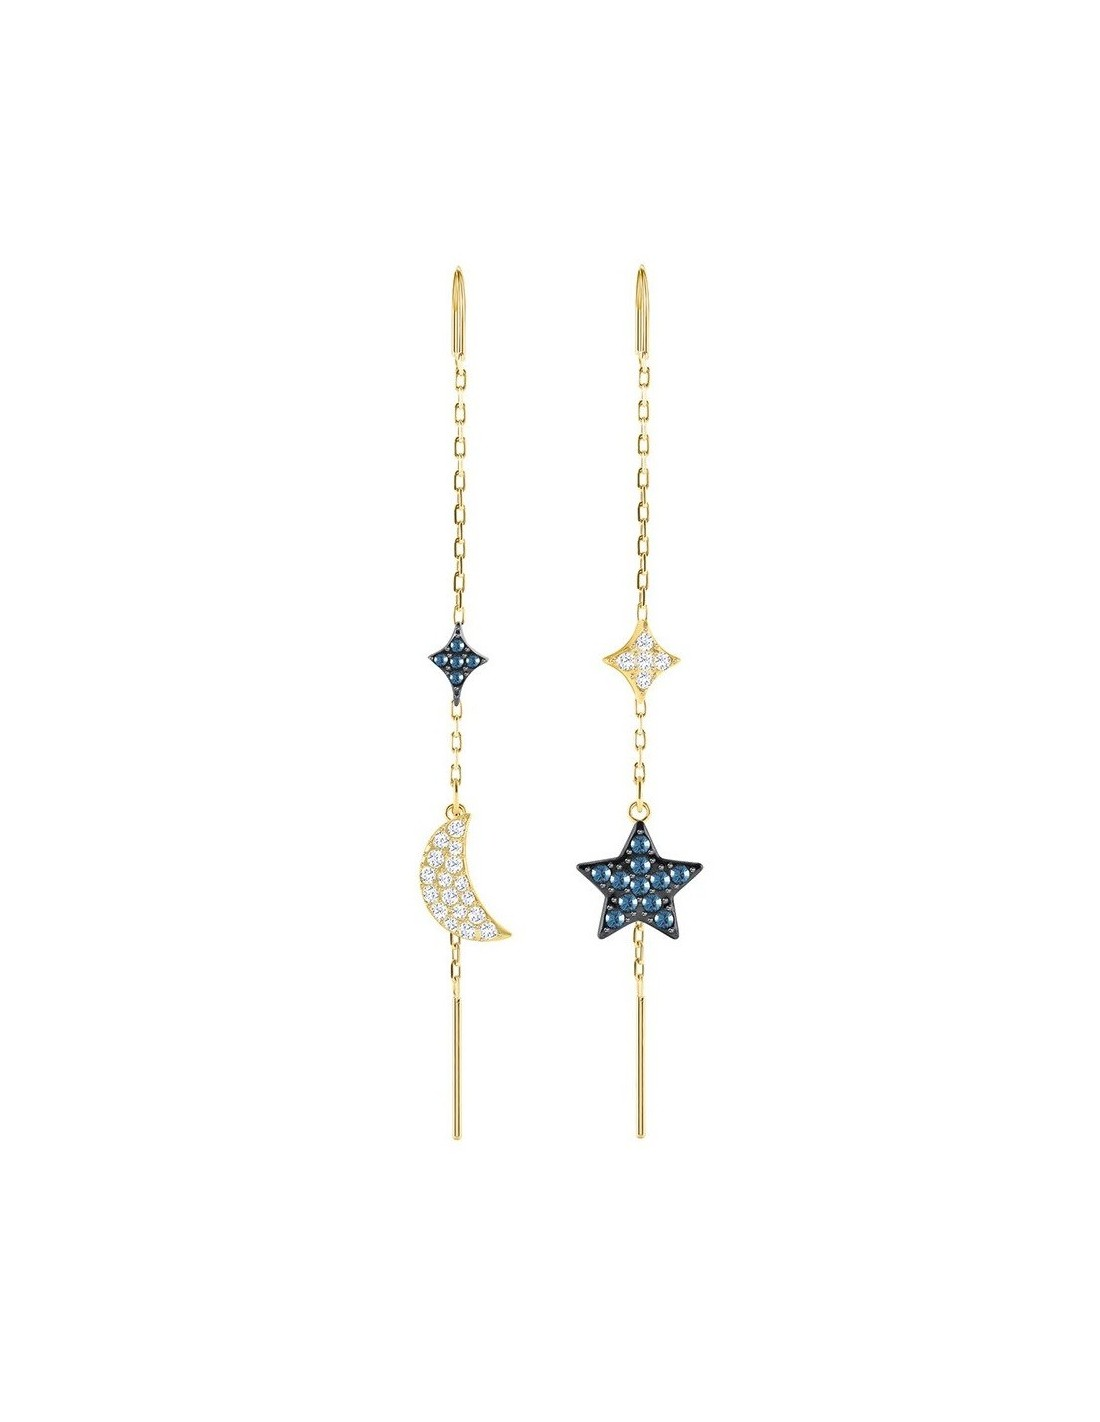 2eeafbe02e84 Duo Moon earrings Swarovski jewelry mixed plating pendants 5412881